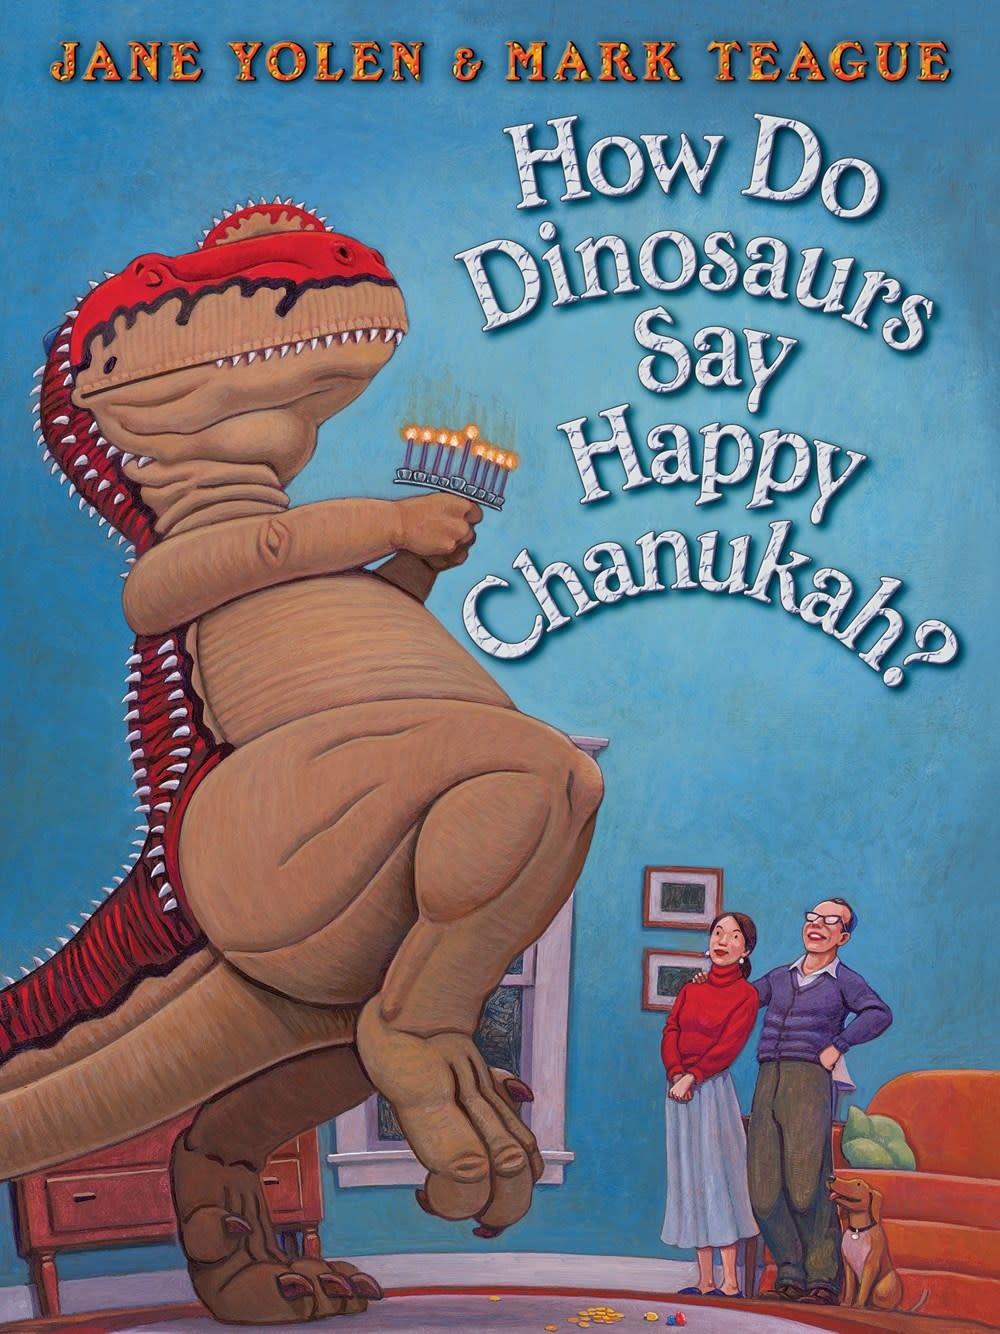 The Blue Sky Press How Do Dinosaurs Say Happy Chanukah?